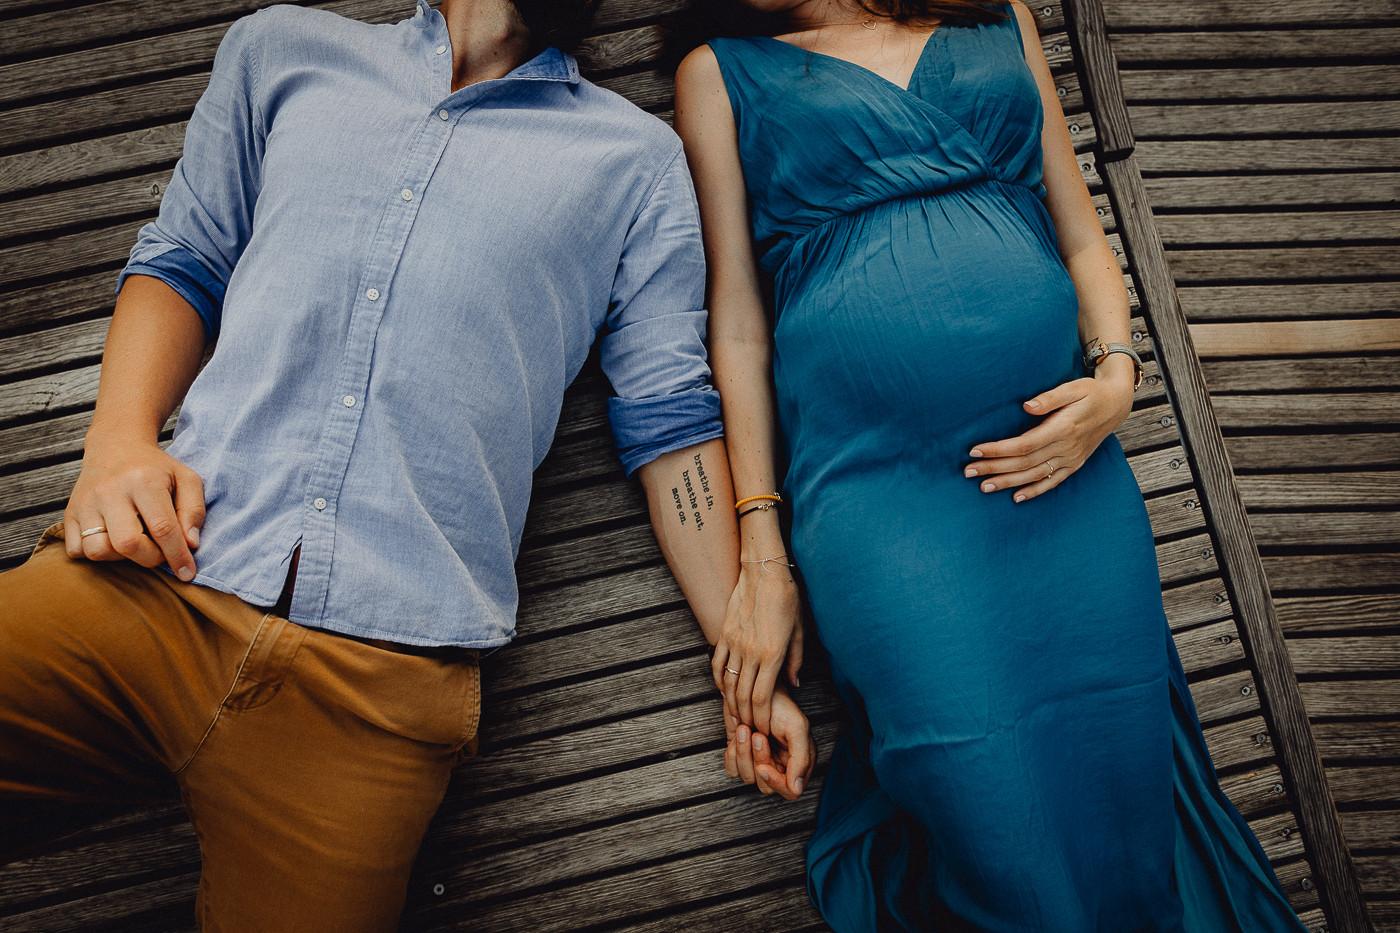 Babybauch, Babybauchfotos, Babybauchfotoshooting, Familienfotoshooting, Natur, Schwangerschaftsfotos Schwangerschaftshooting